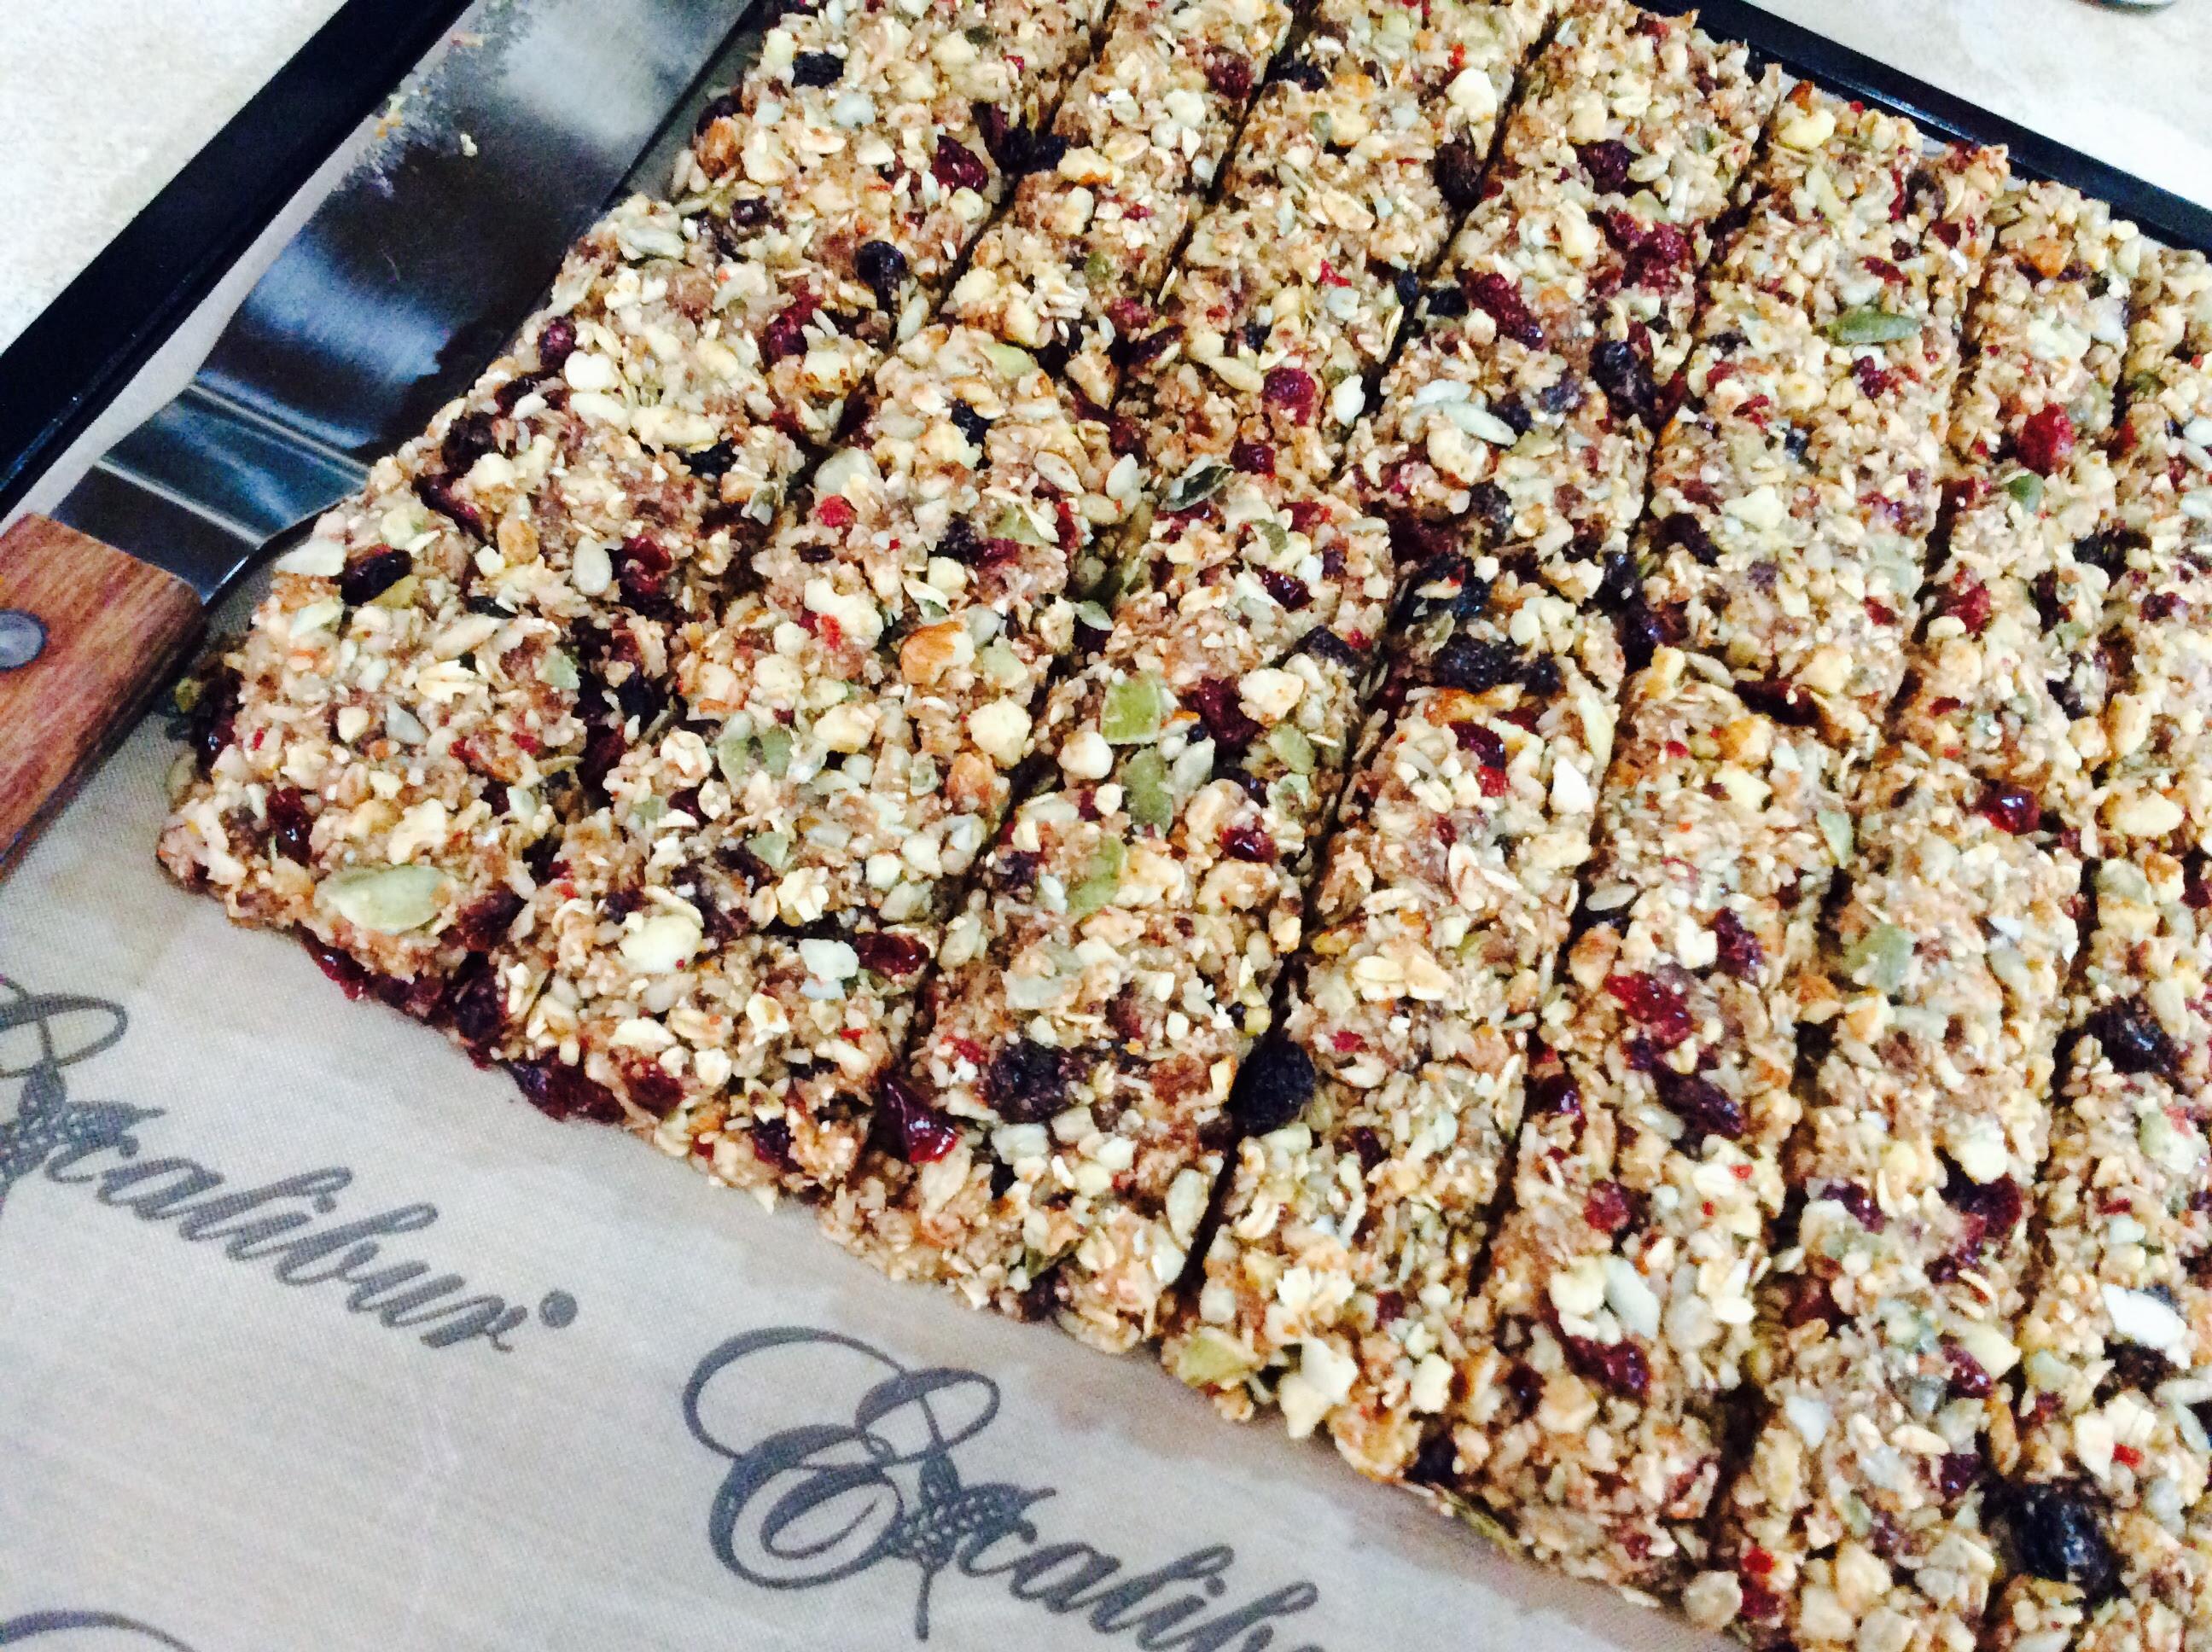 Homemade Raw Vegan Granola Bars - Forget The Box